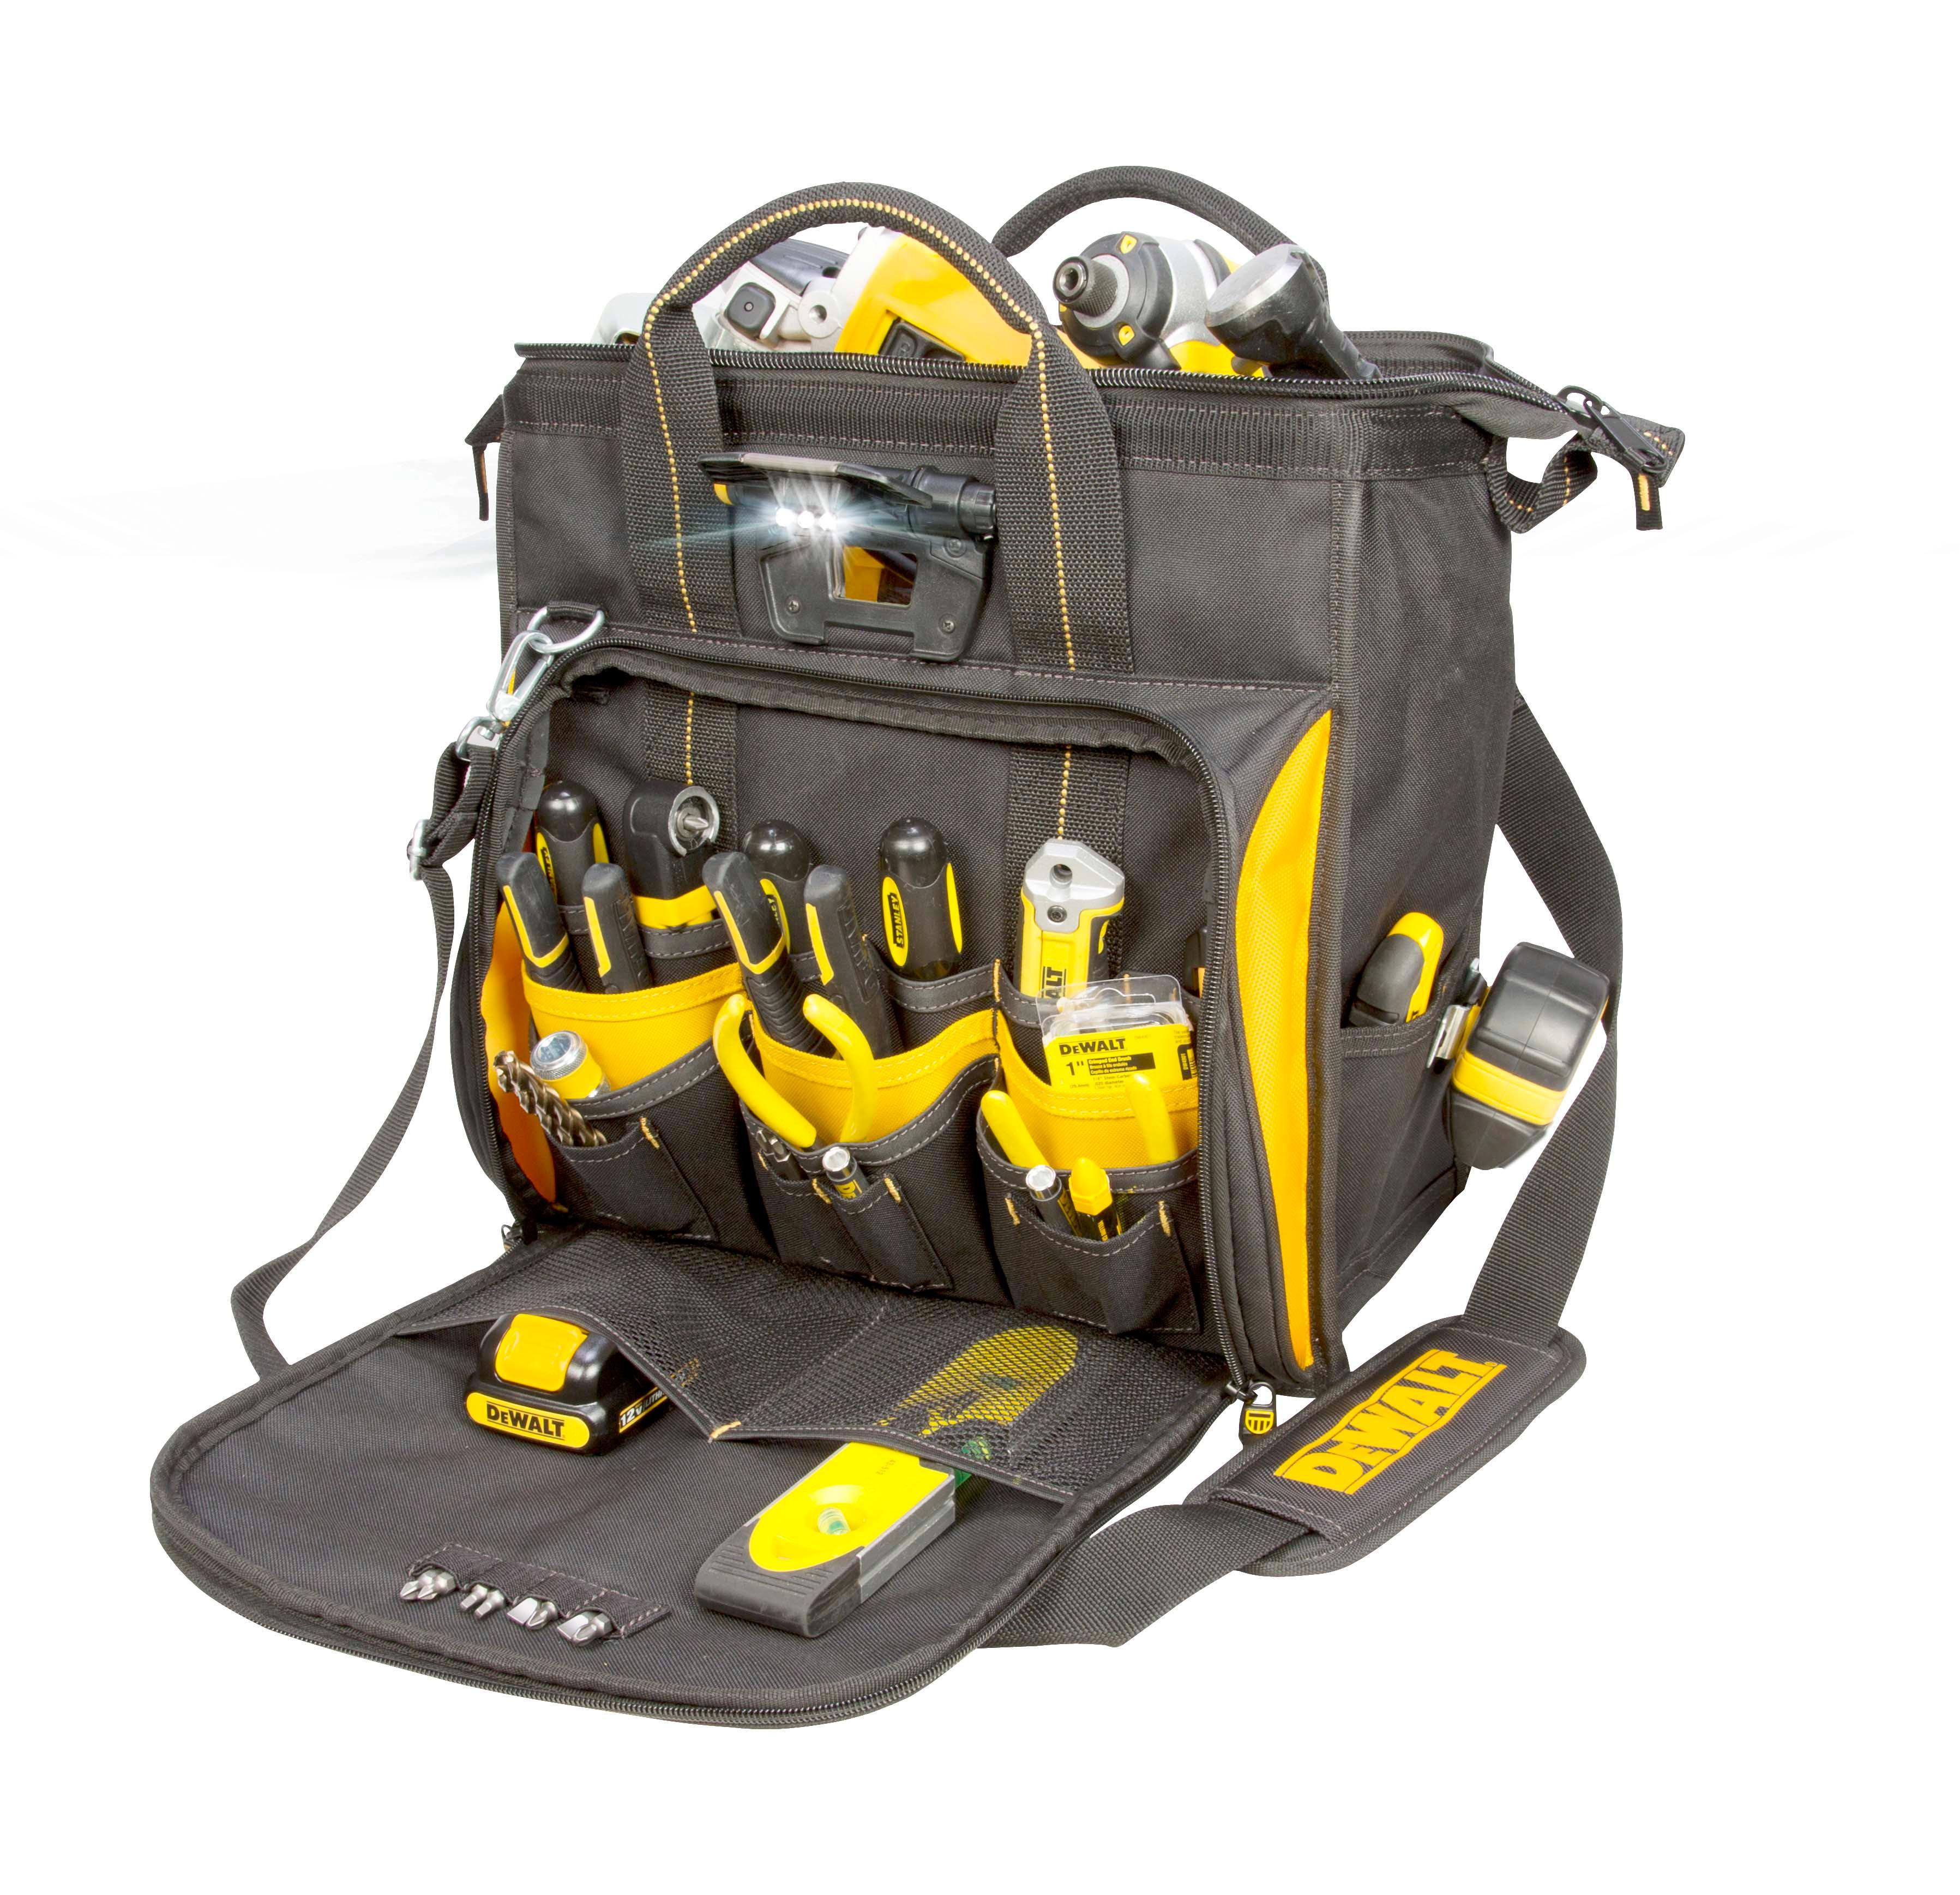 DEWALT DGL573 Lighted Technician's Tool Bag - - Amazon.com